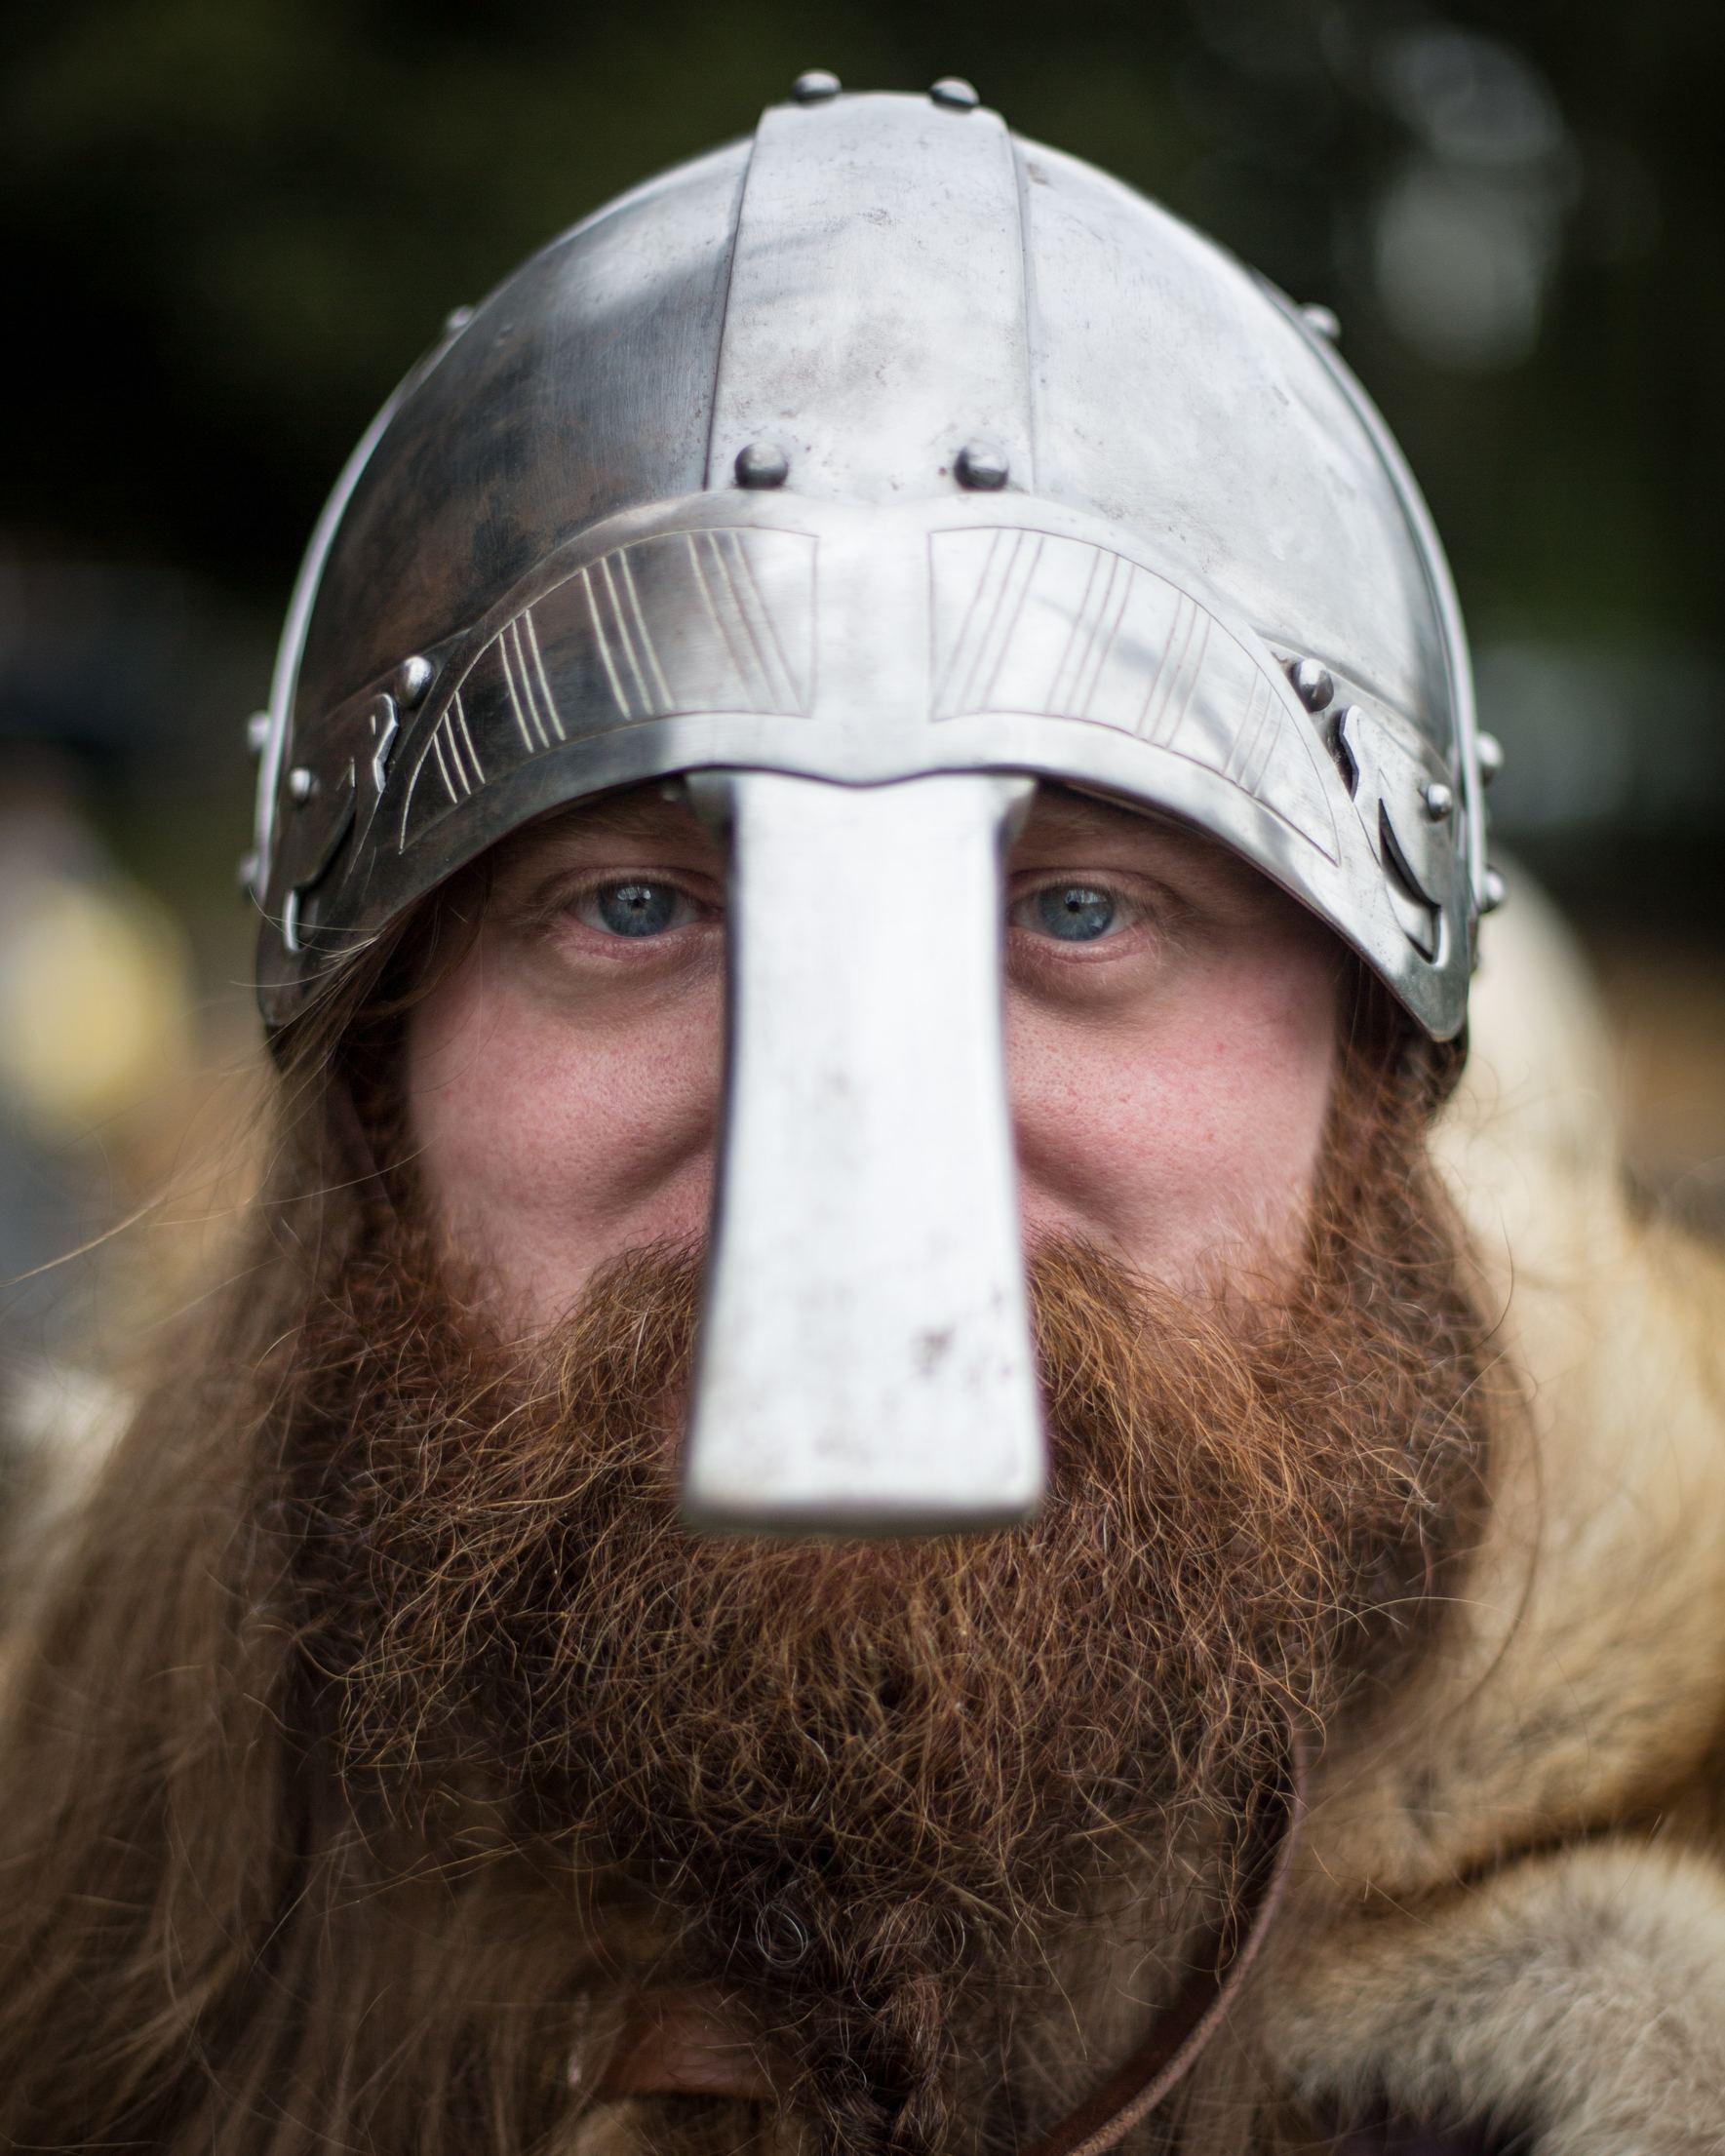 Viking Photo by Jonathan Farber on Unsplash